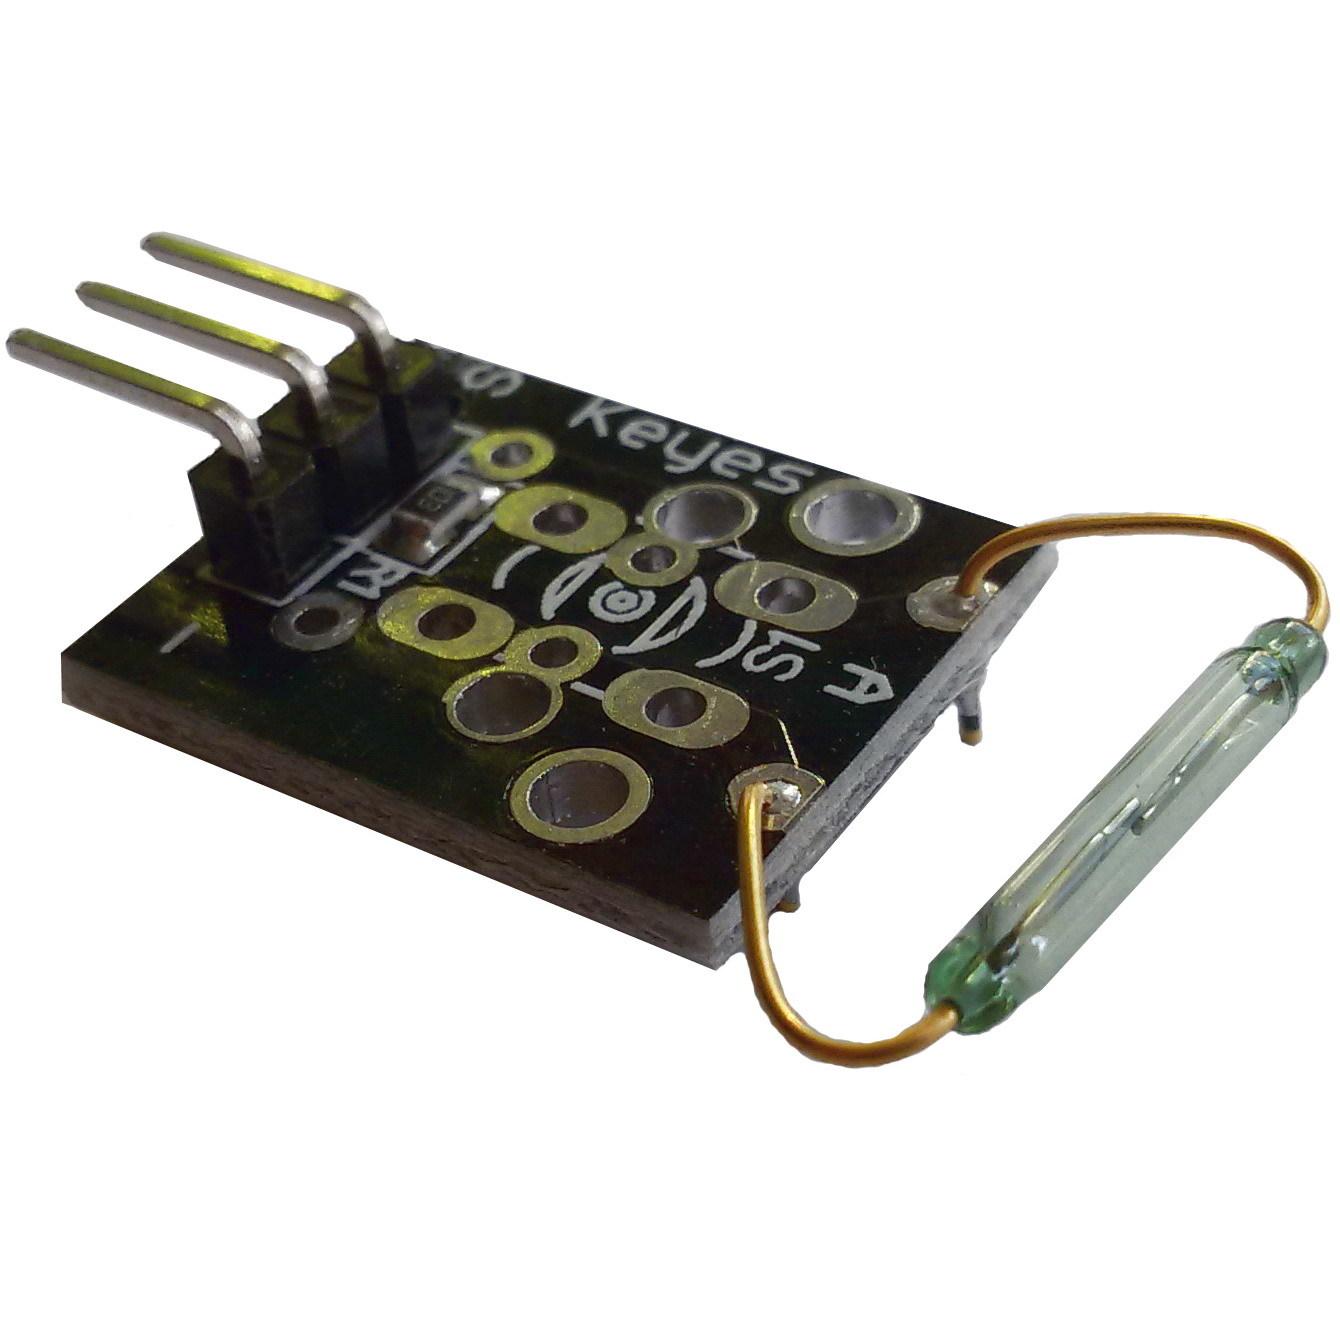 Модуль с герконом KY-021 MINI SWITCH